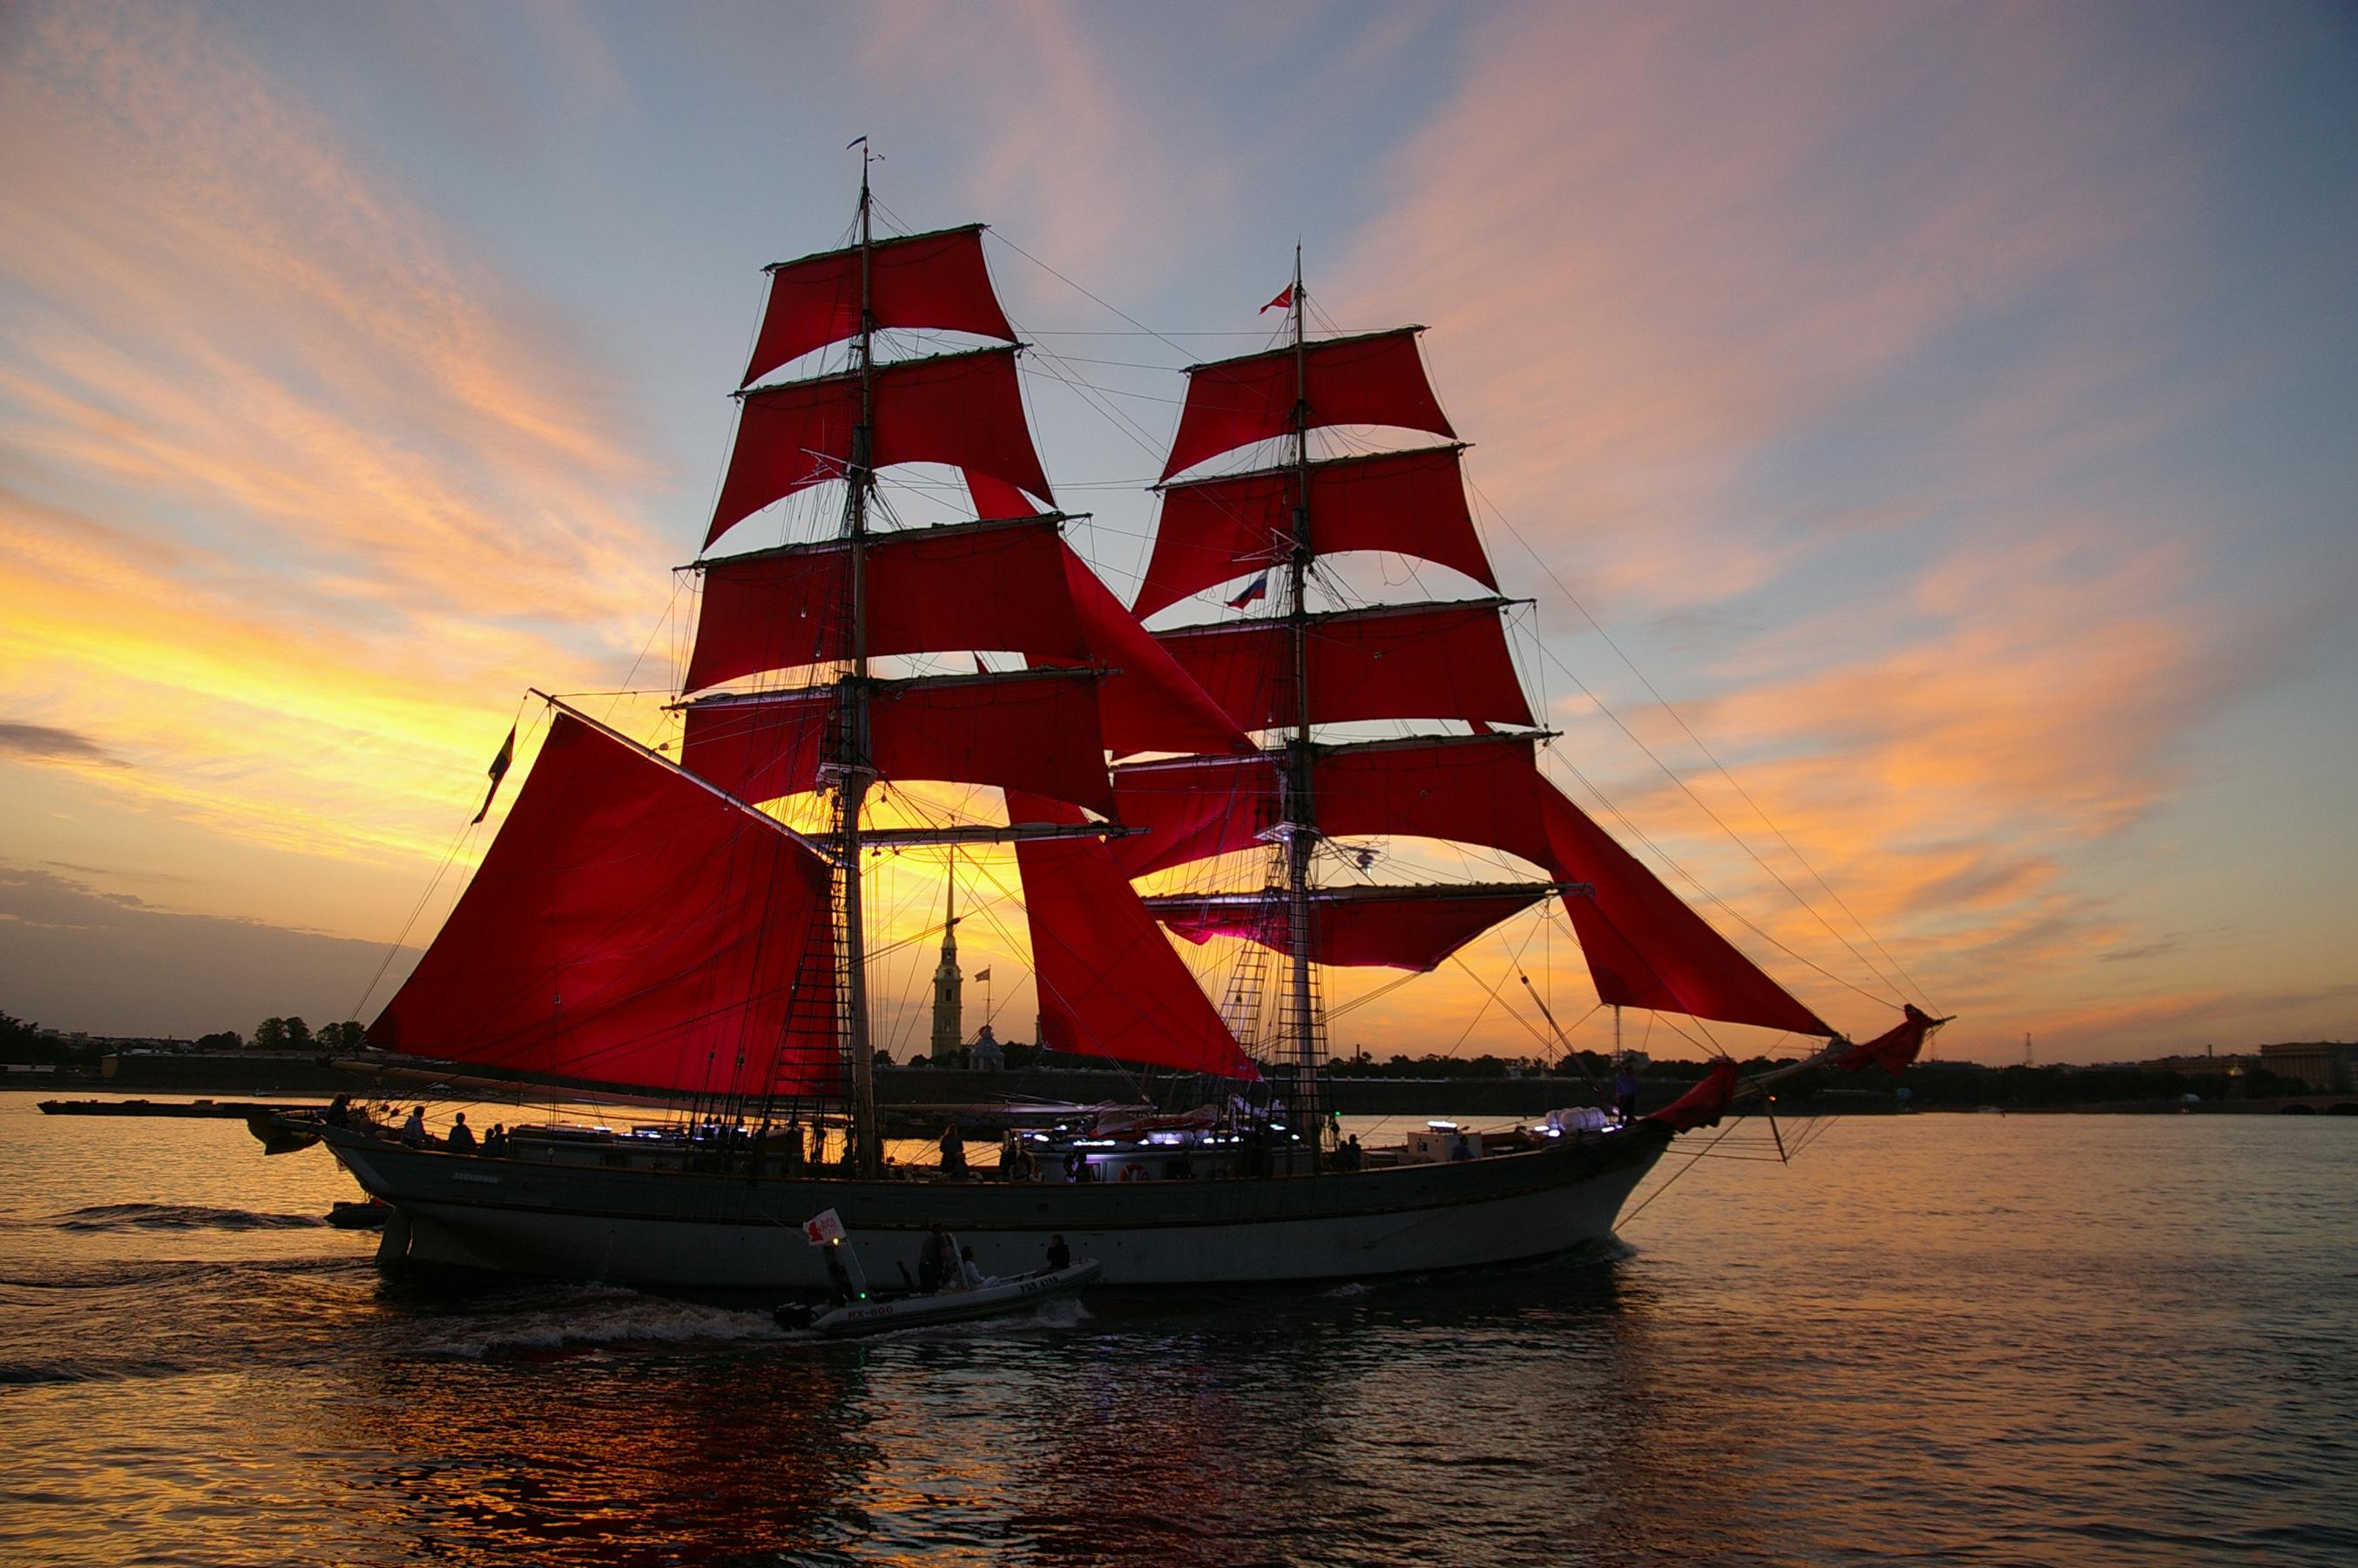 Картинки кораблей с парусами фото